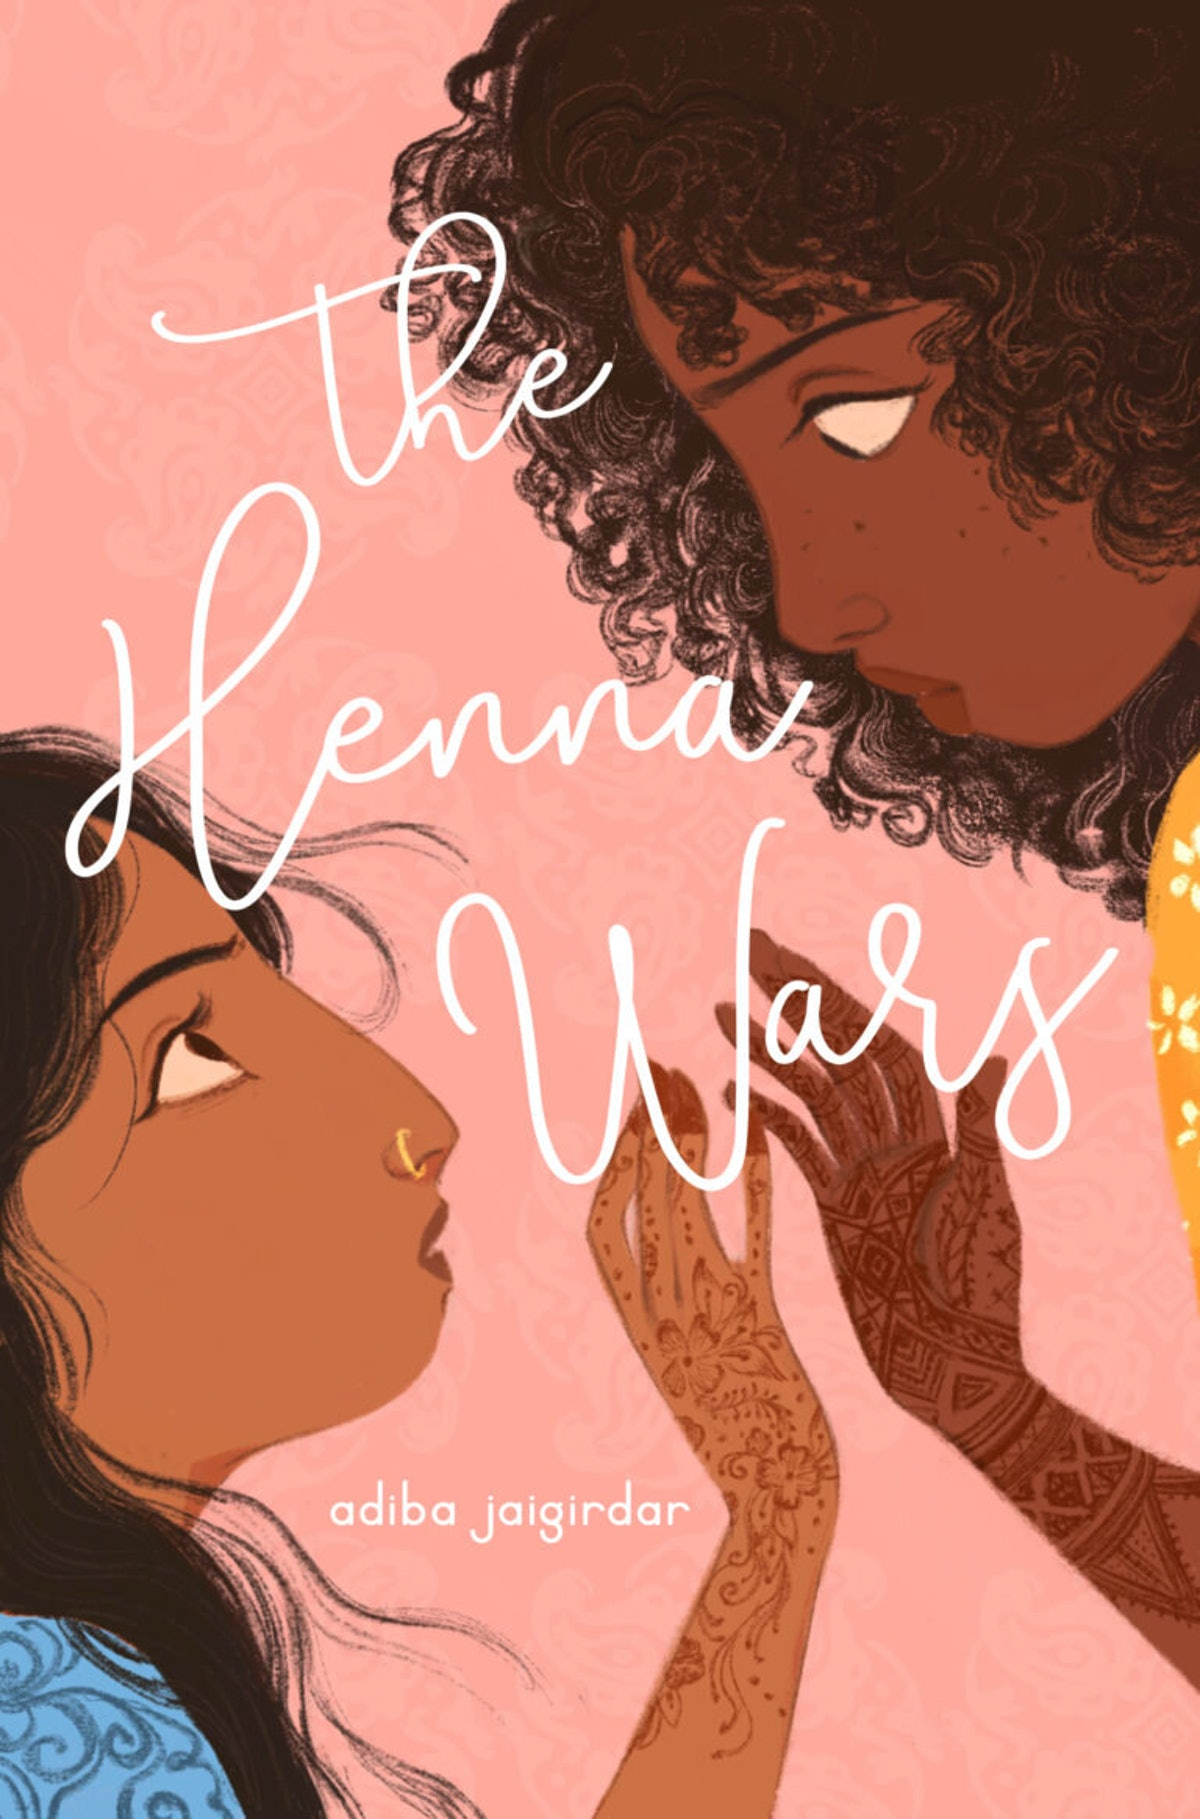 'The Henna Wars' — Adiba Jaigirdar